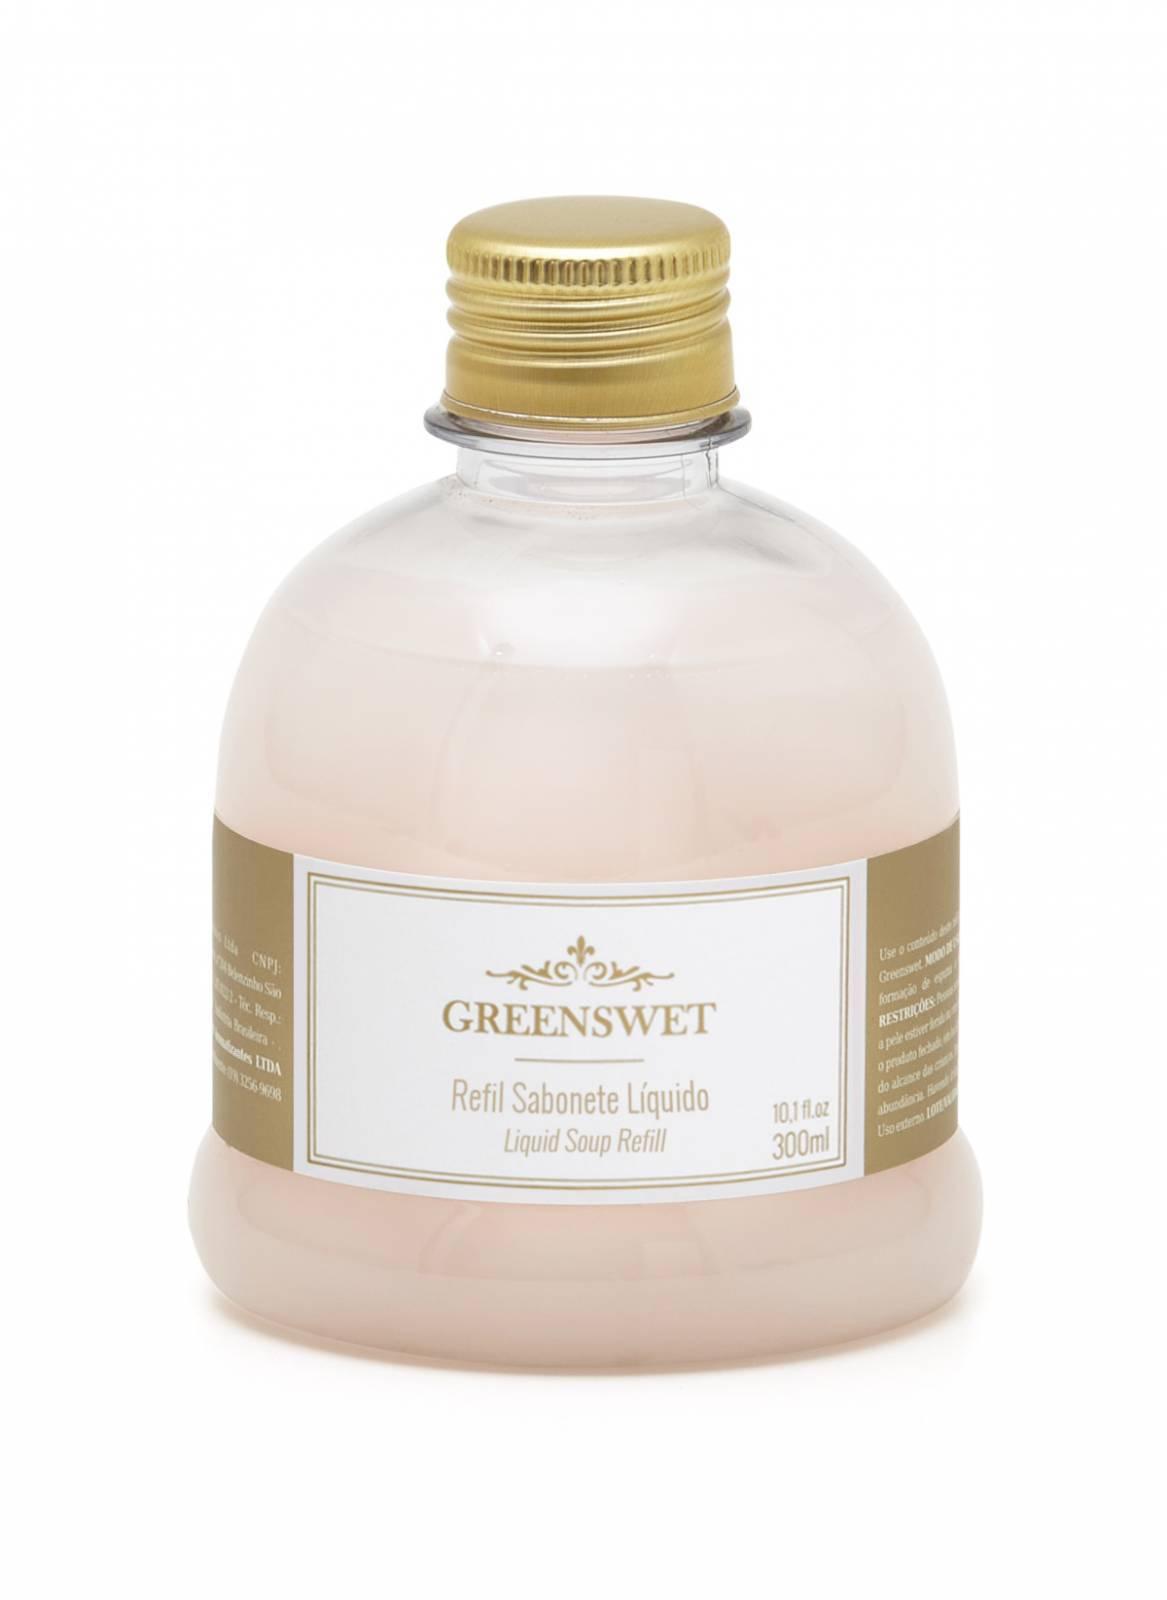 Refil Sabonete Liquido 300 ml Essência Vanilla - Greenswet Aromatizantes